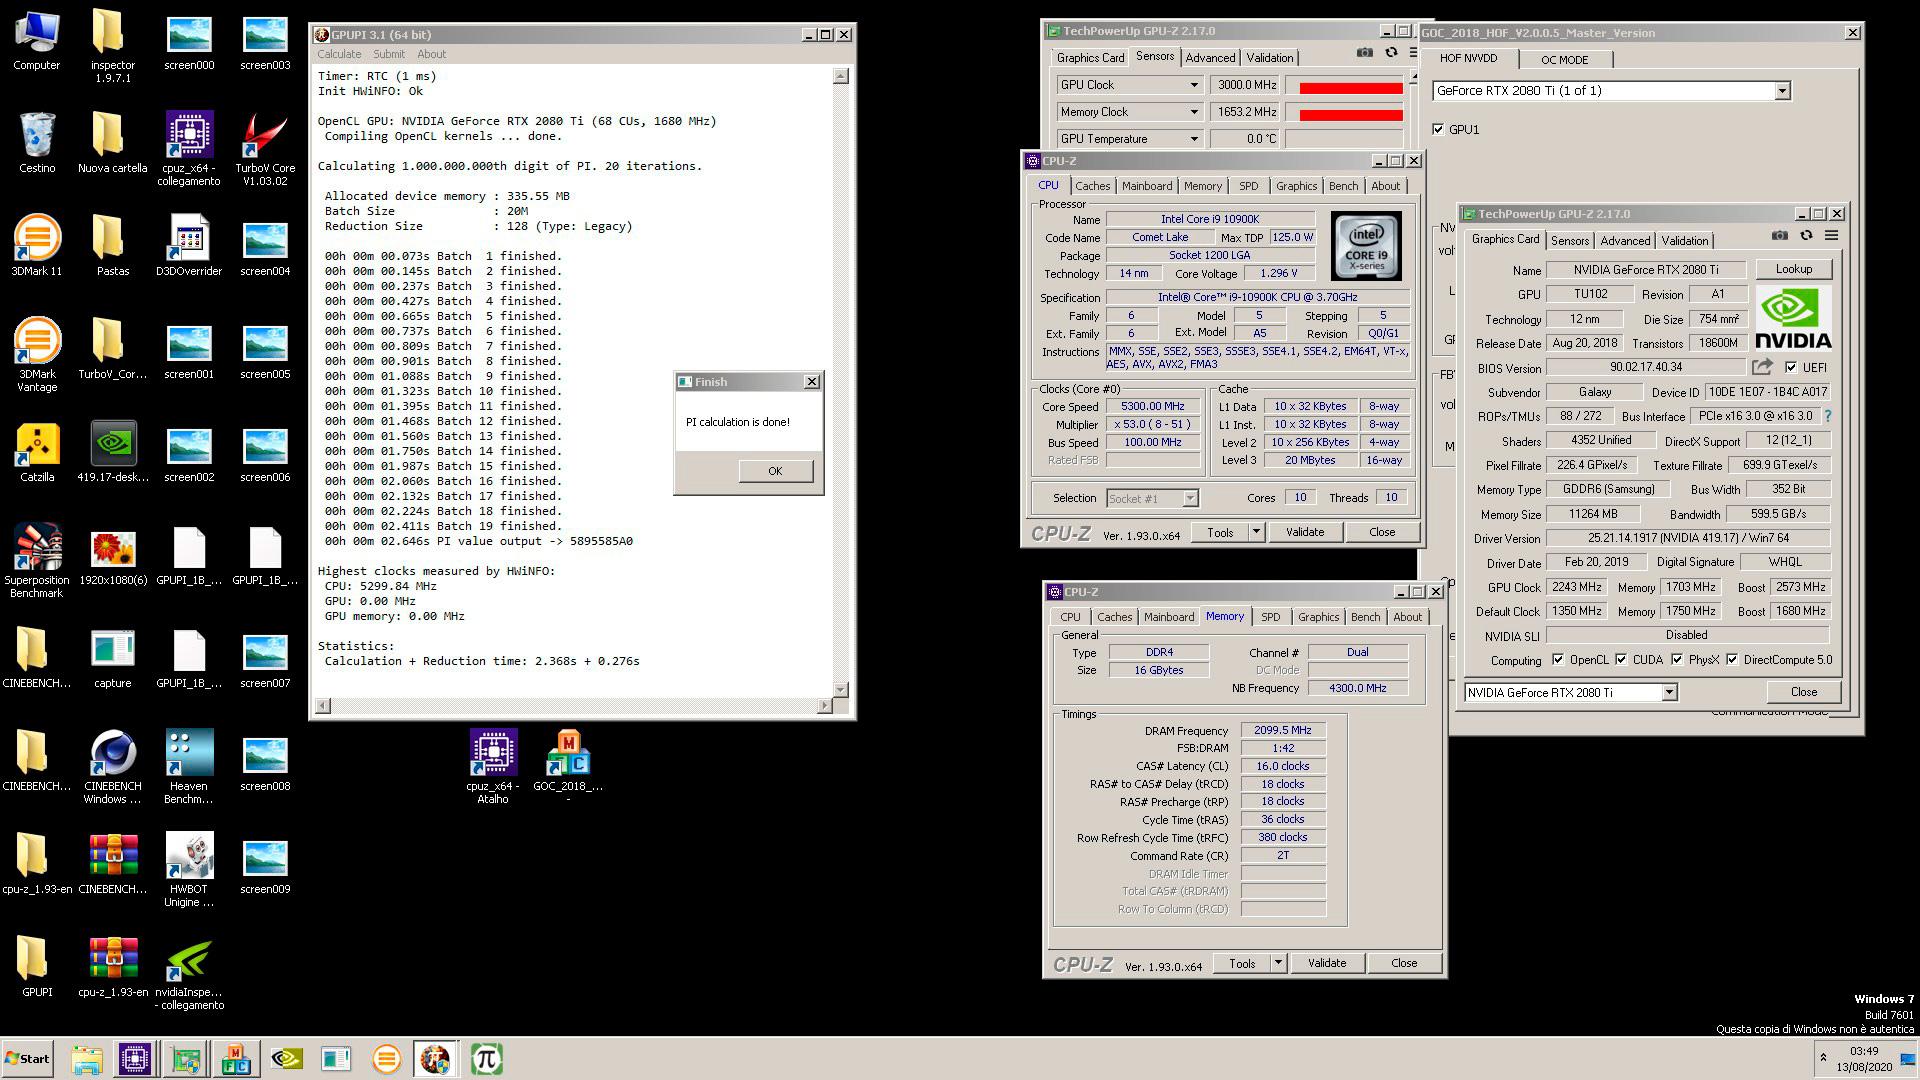 Потенциал в потенциаловнице ещё есть! GeForce RTX 2080 Ti разогнана по ядру до 3 ГГц